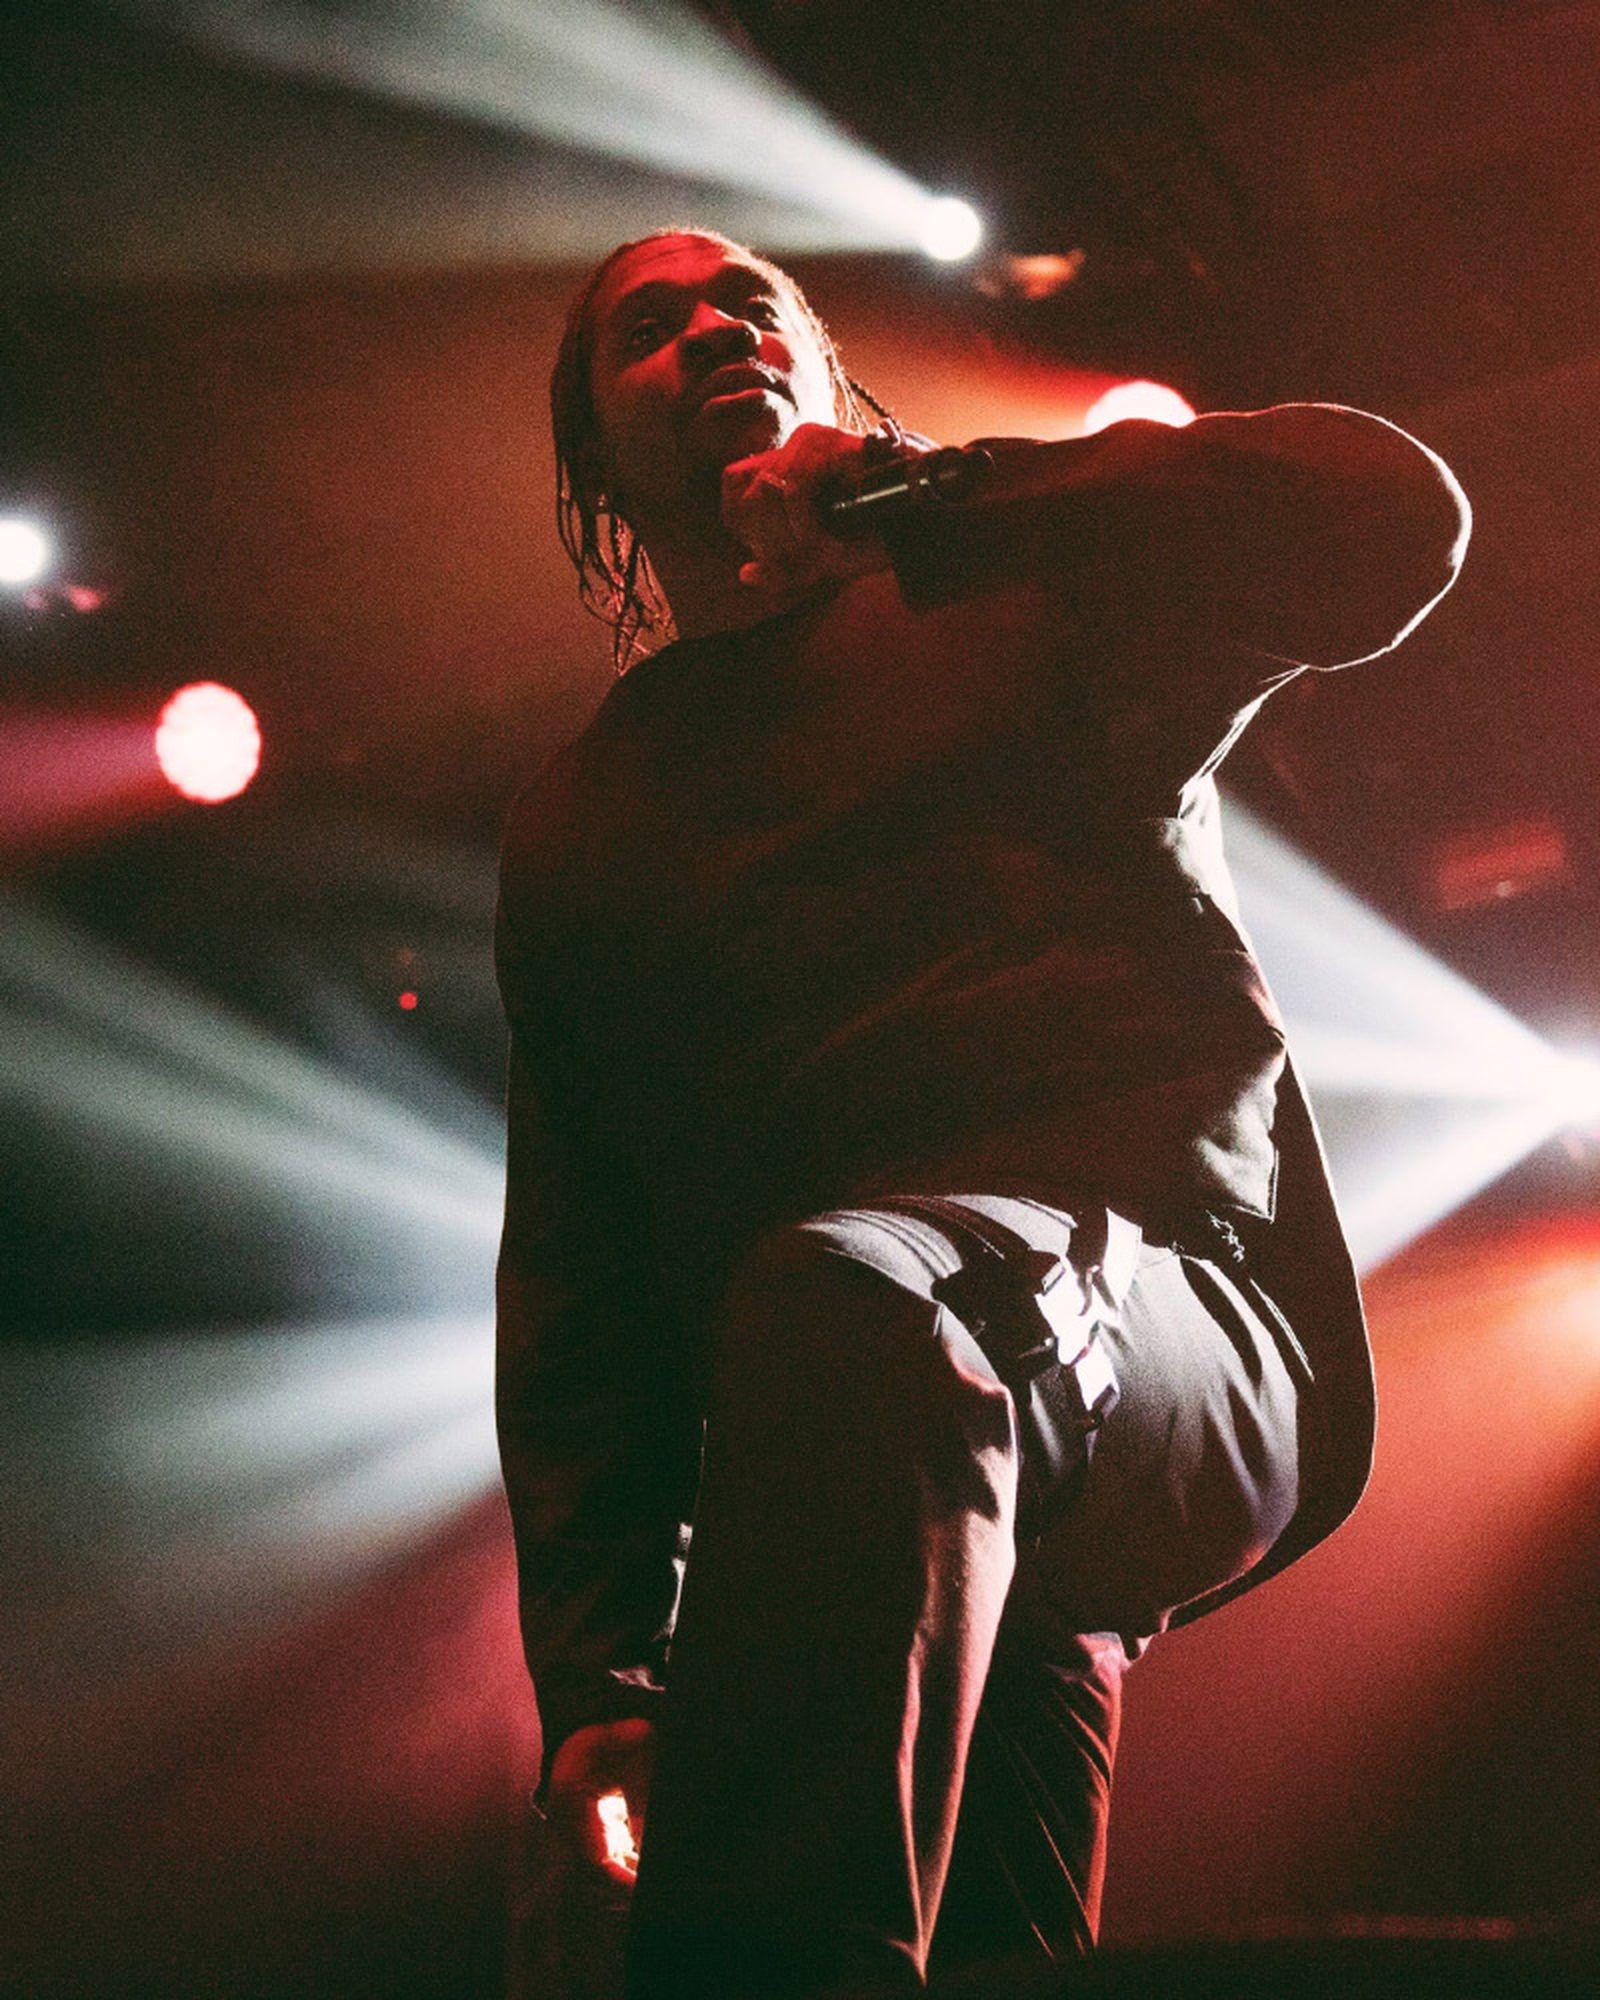 ageisms-foothold-hip-hop-observable-internalized-pushat